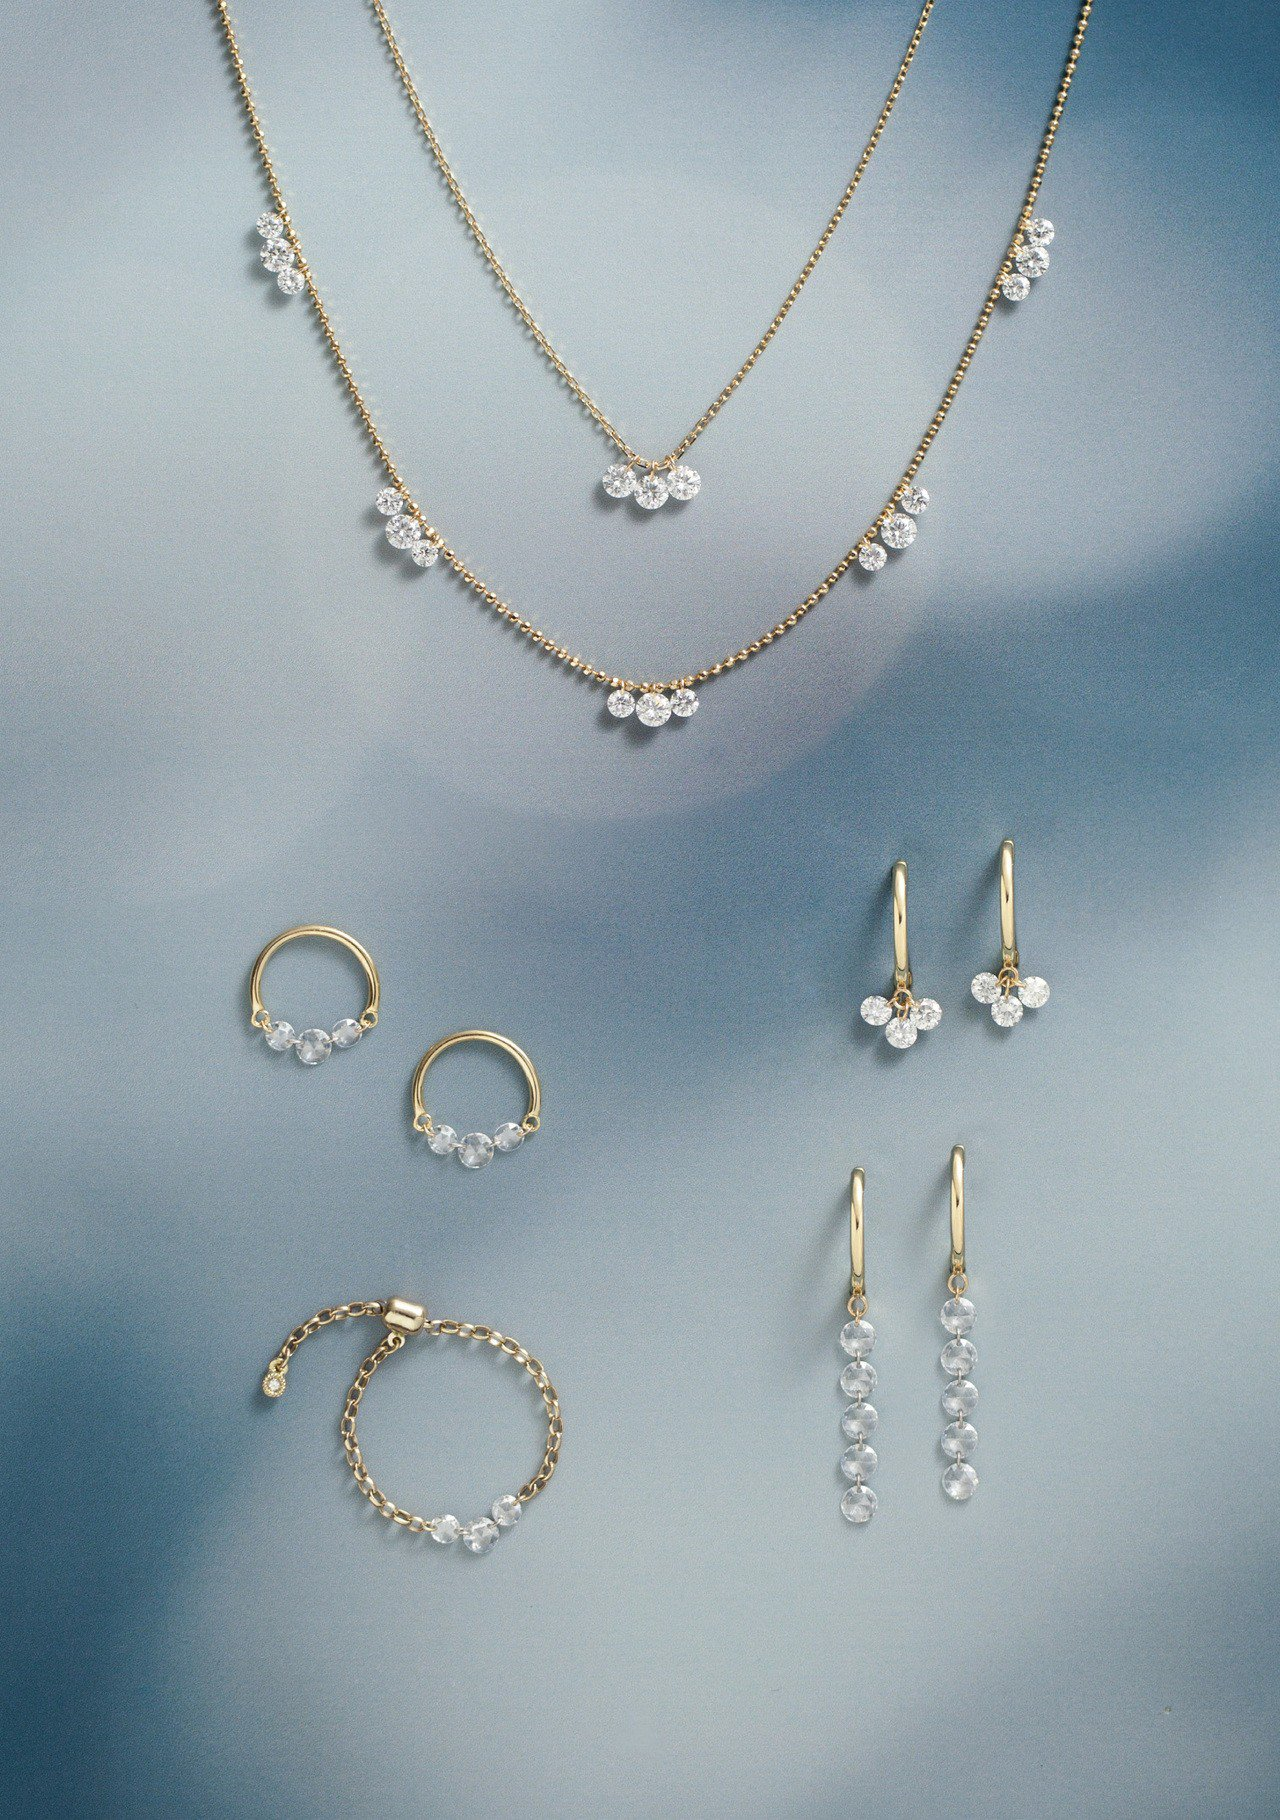 AbHerï激光穿孔鑽石系列,輕盈搭配性高。圖/JOYCOLORi提供